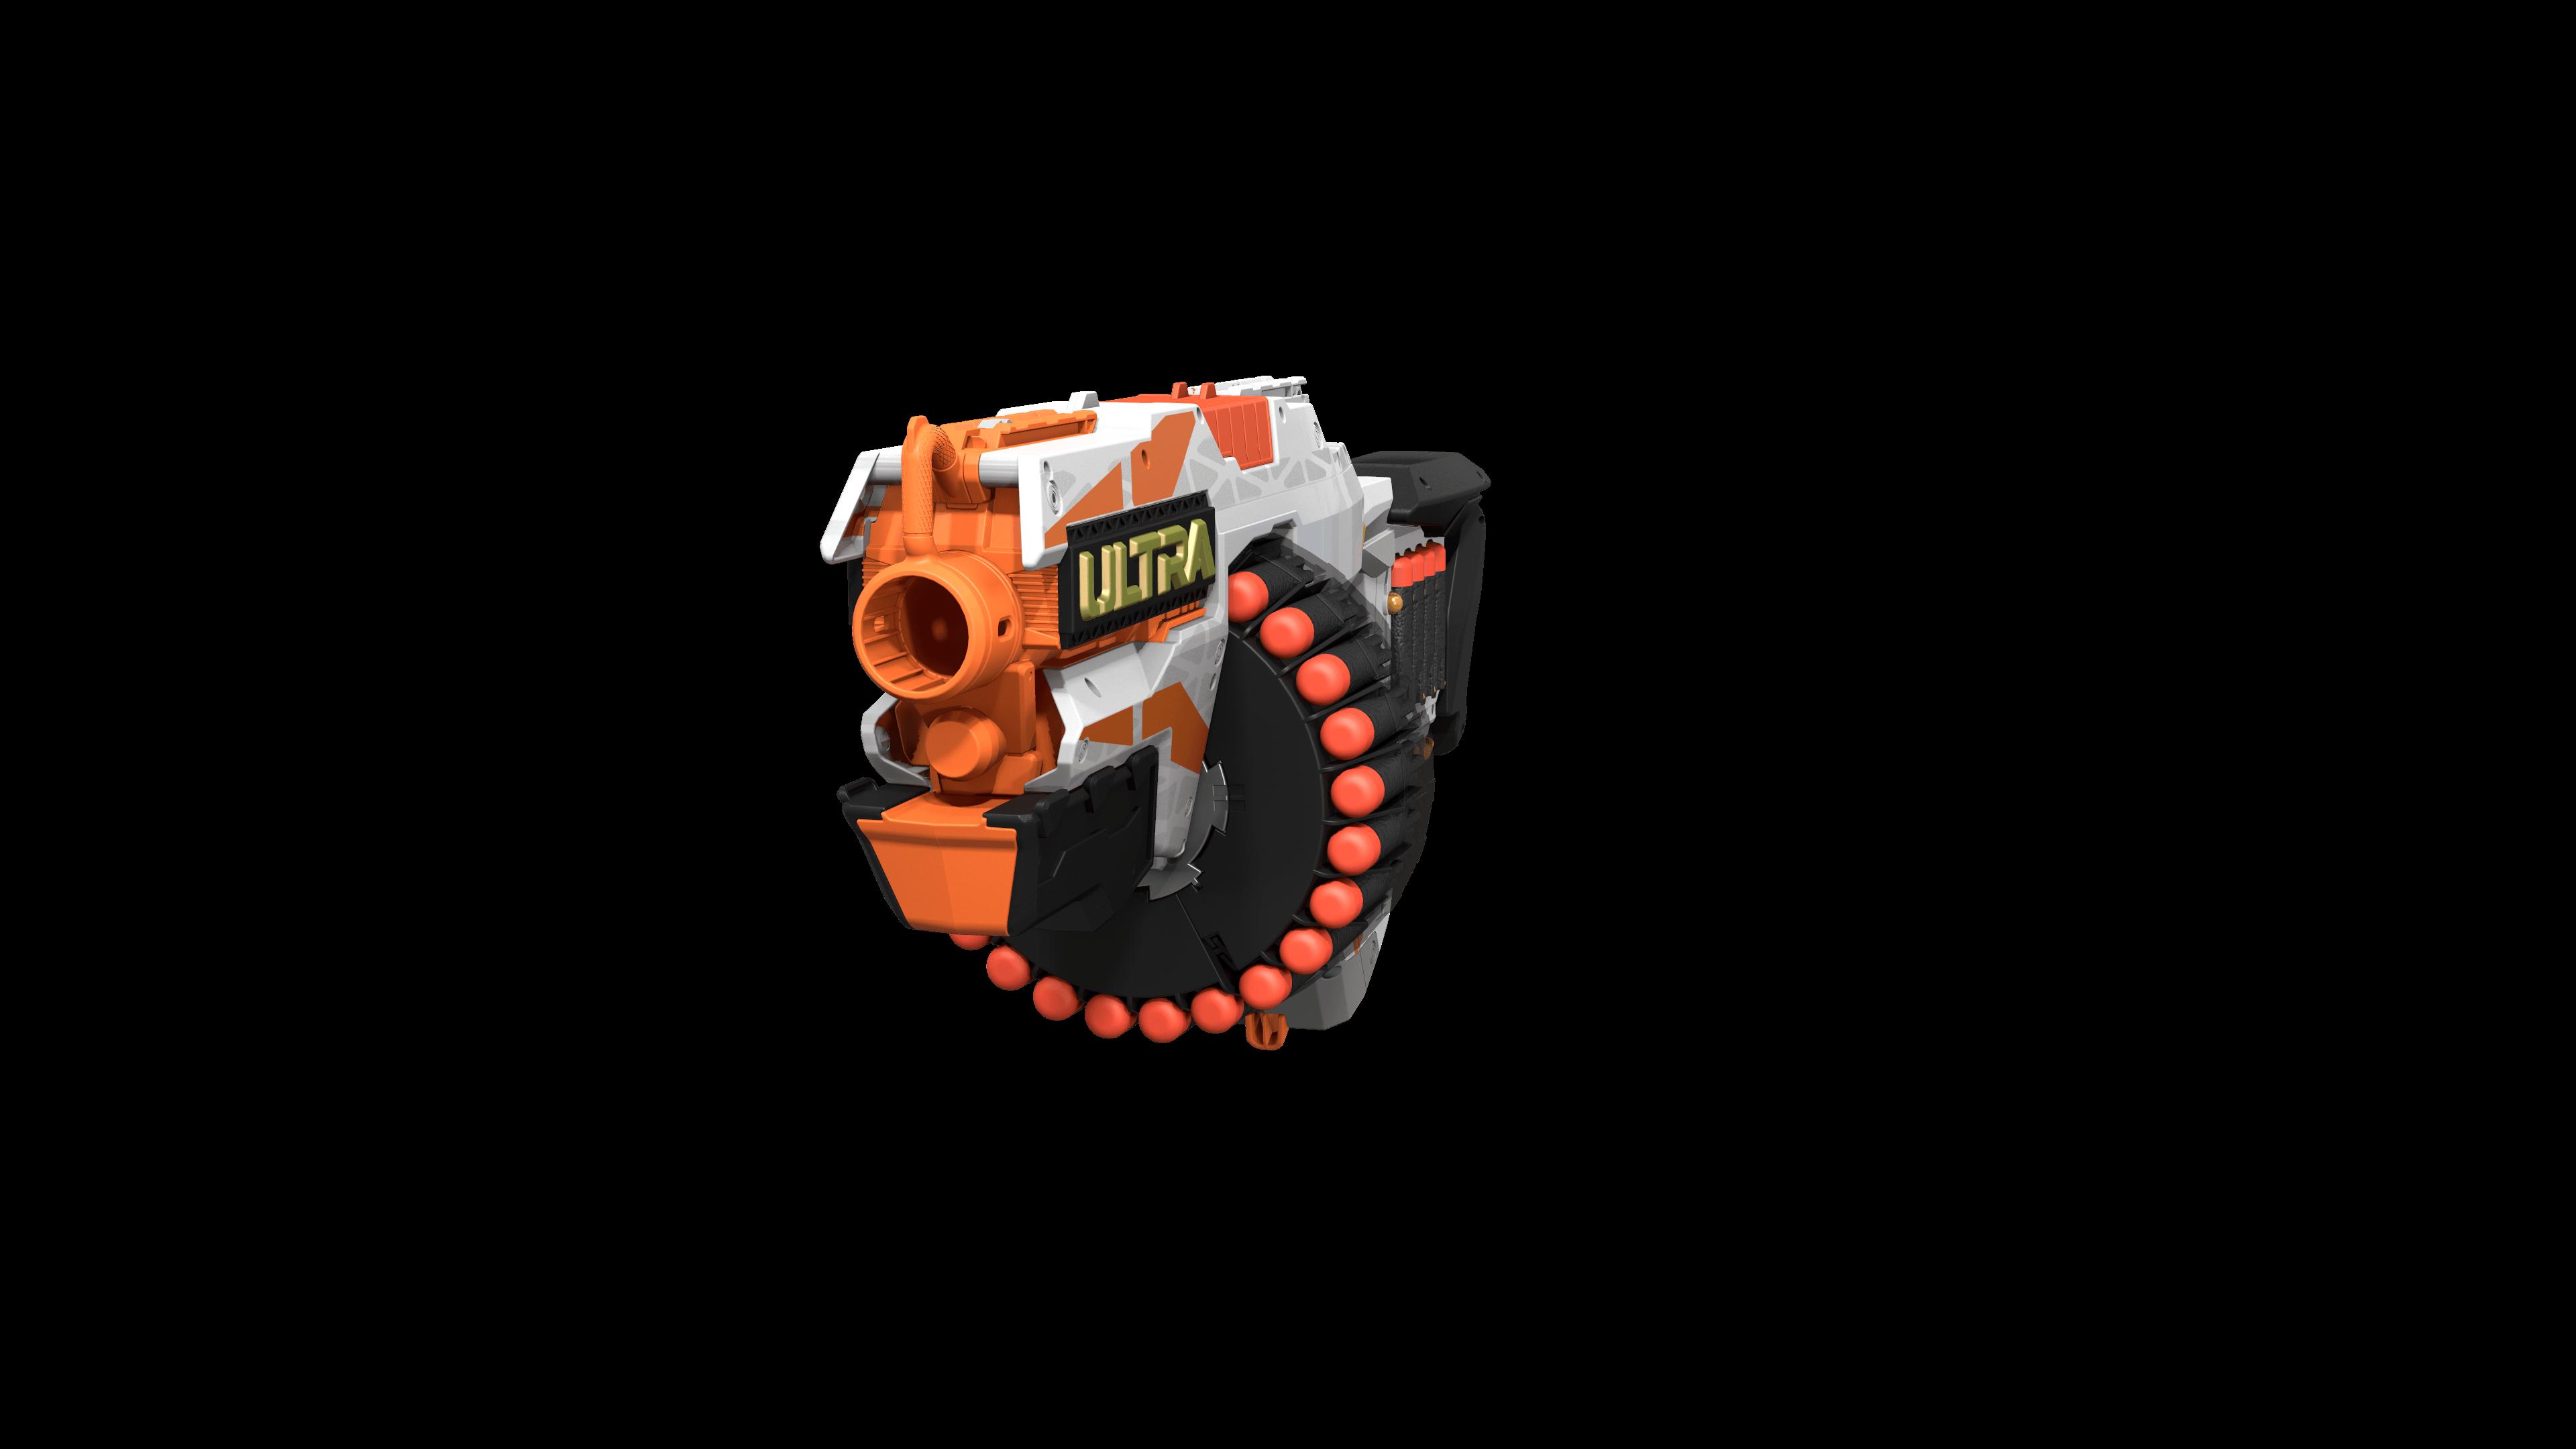 ultra blaster img 86